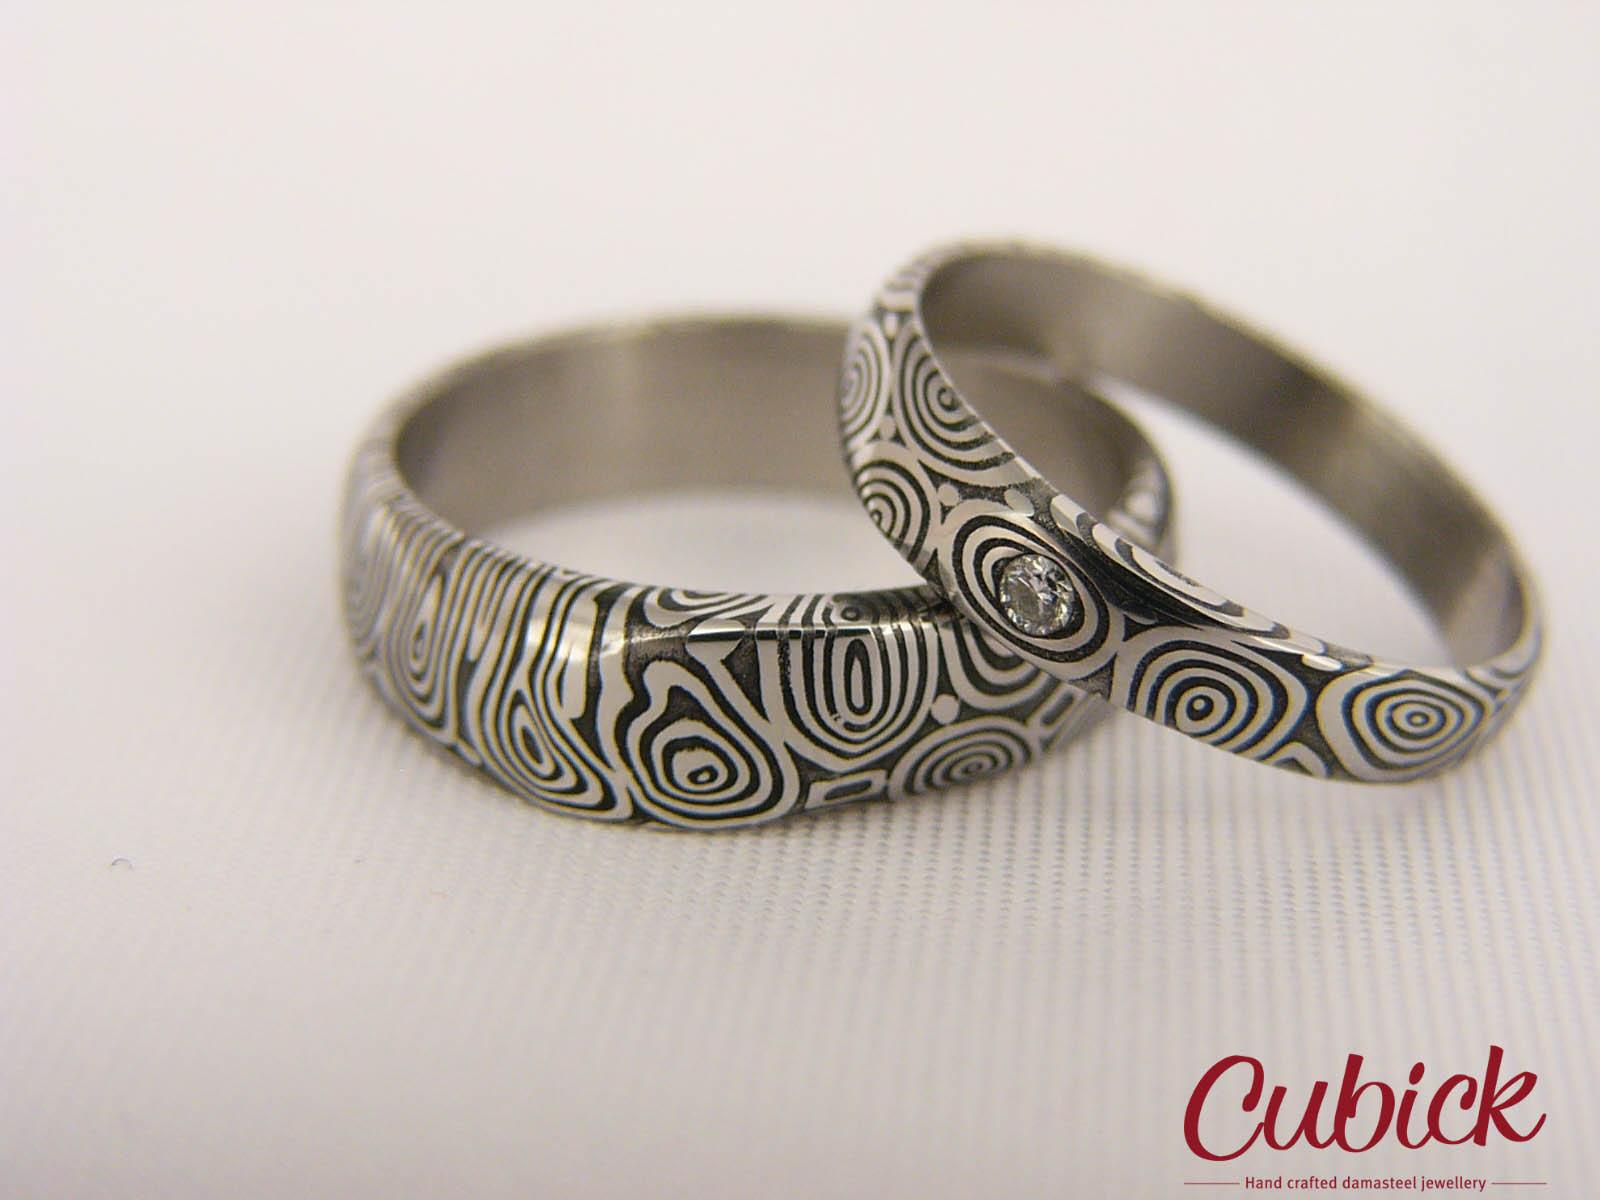 Jaky Zvolit Material Snubich Prstenu Svatebn